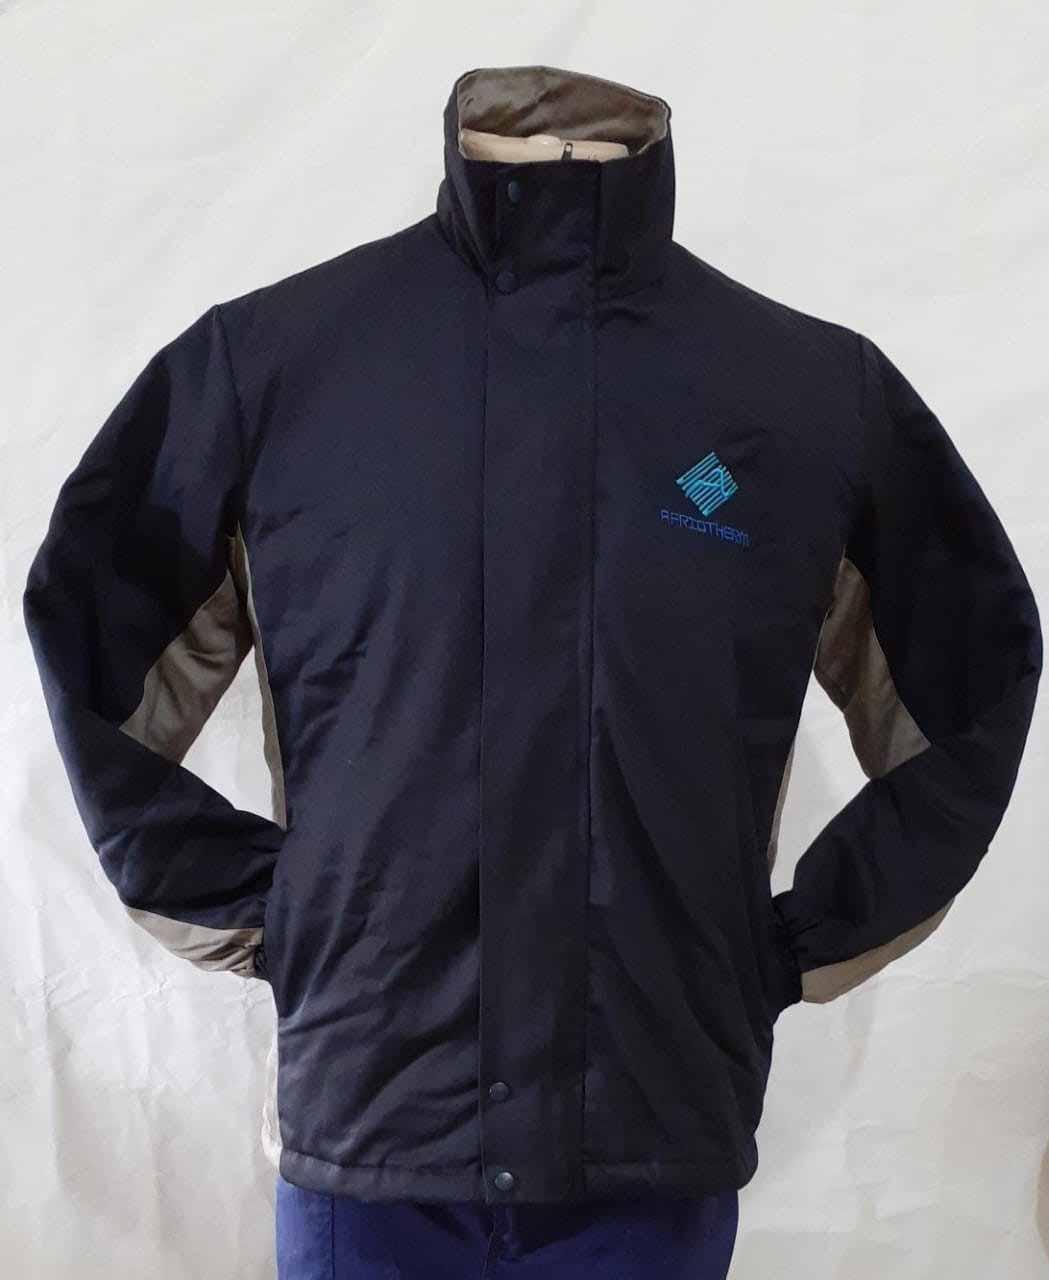 Jaquetas para empresas